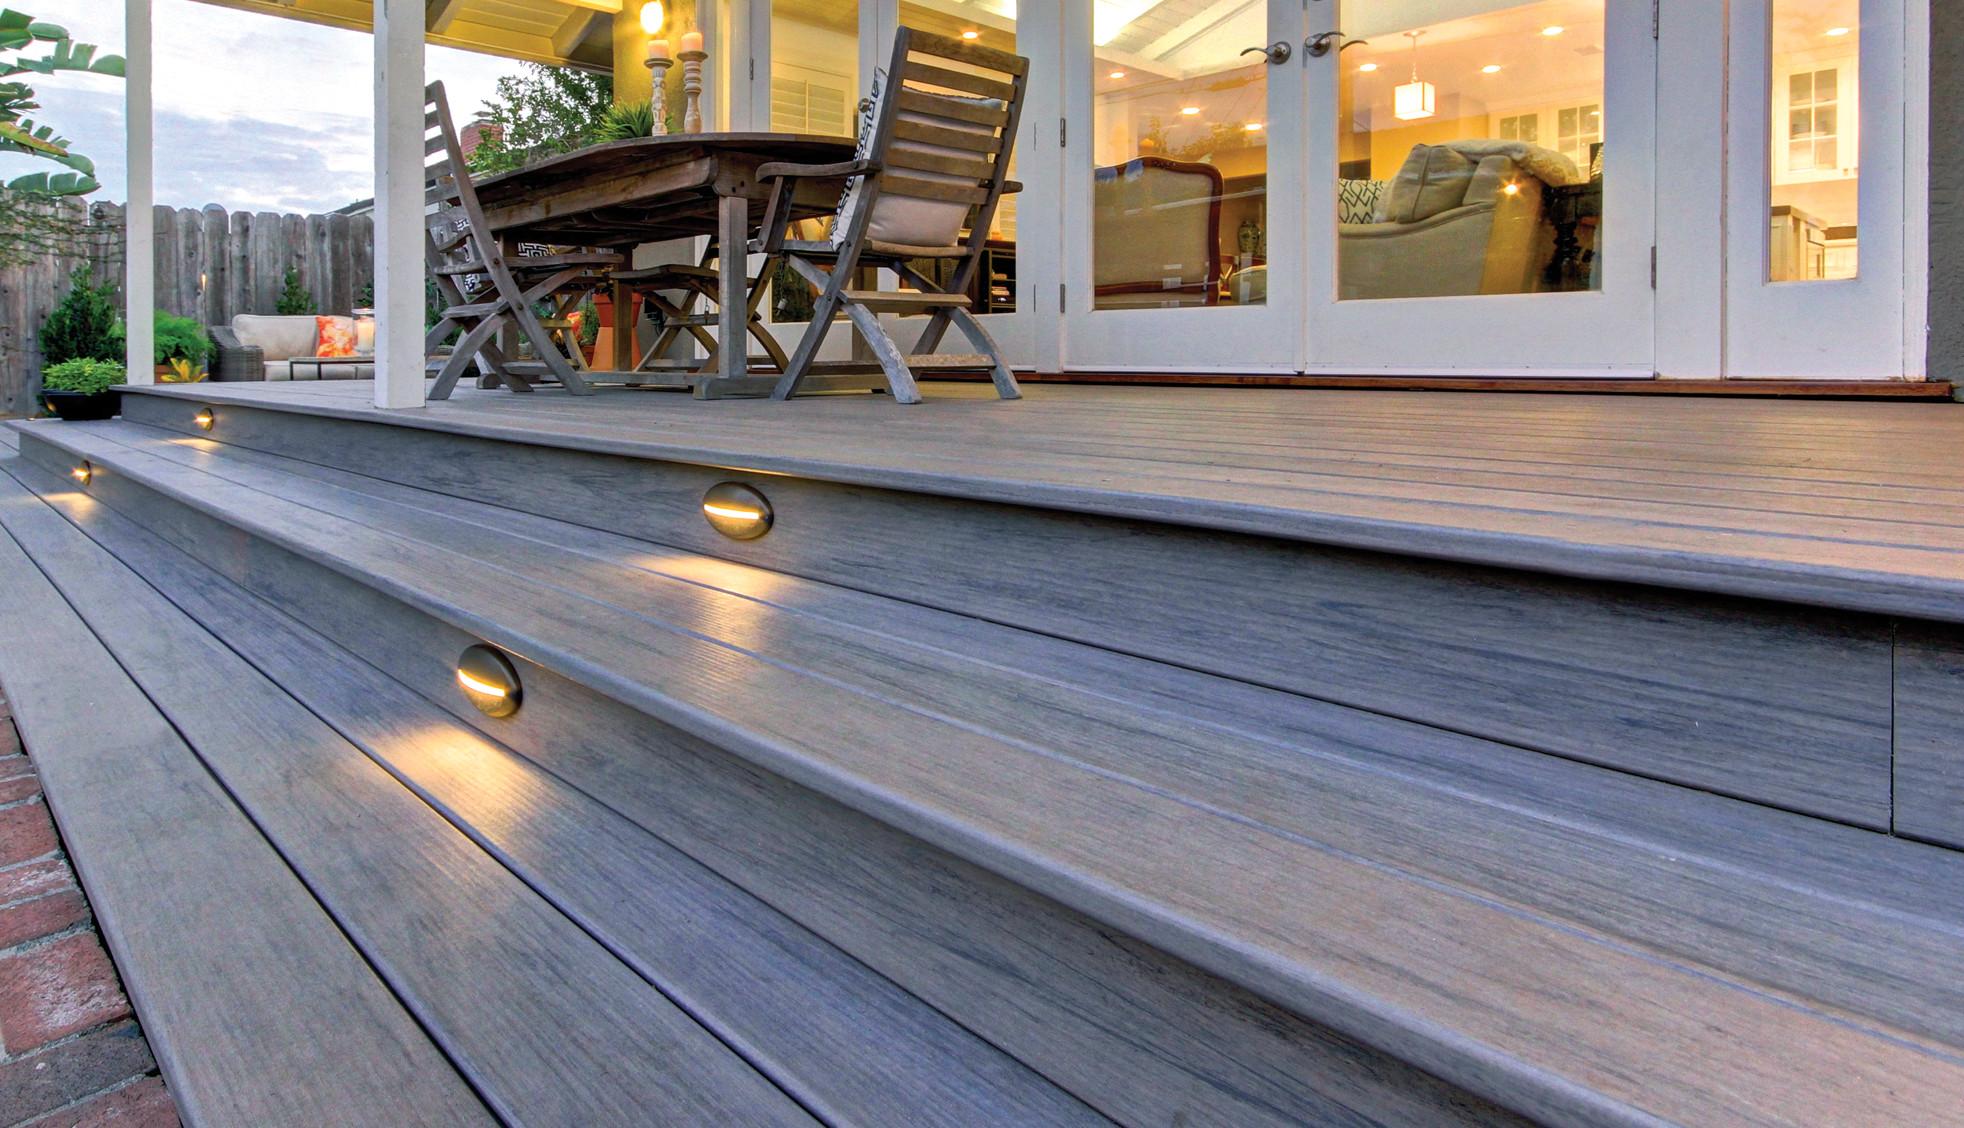 TimberTech Terrassen-Setzstufenleuchten – Ansicht 1